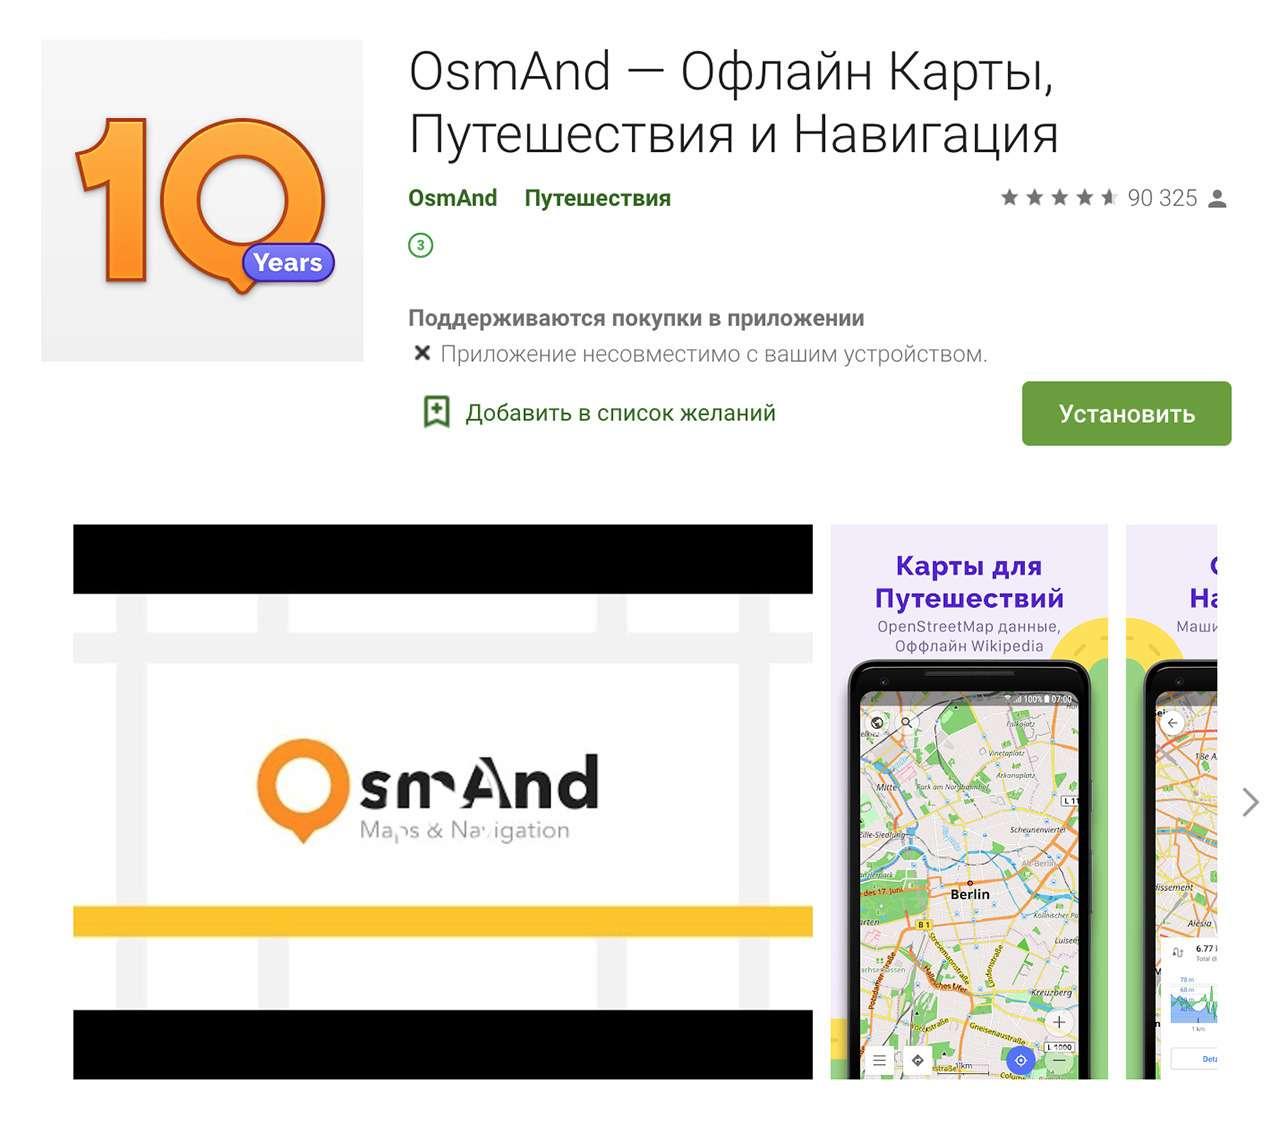 6 альтернатив Яндекс.Навигатору. Выберите свою— фото 1195245